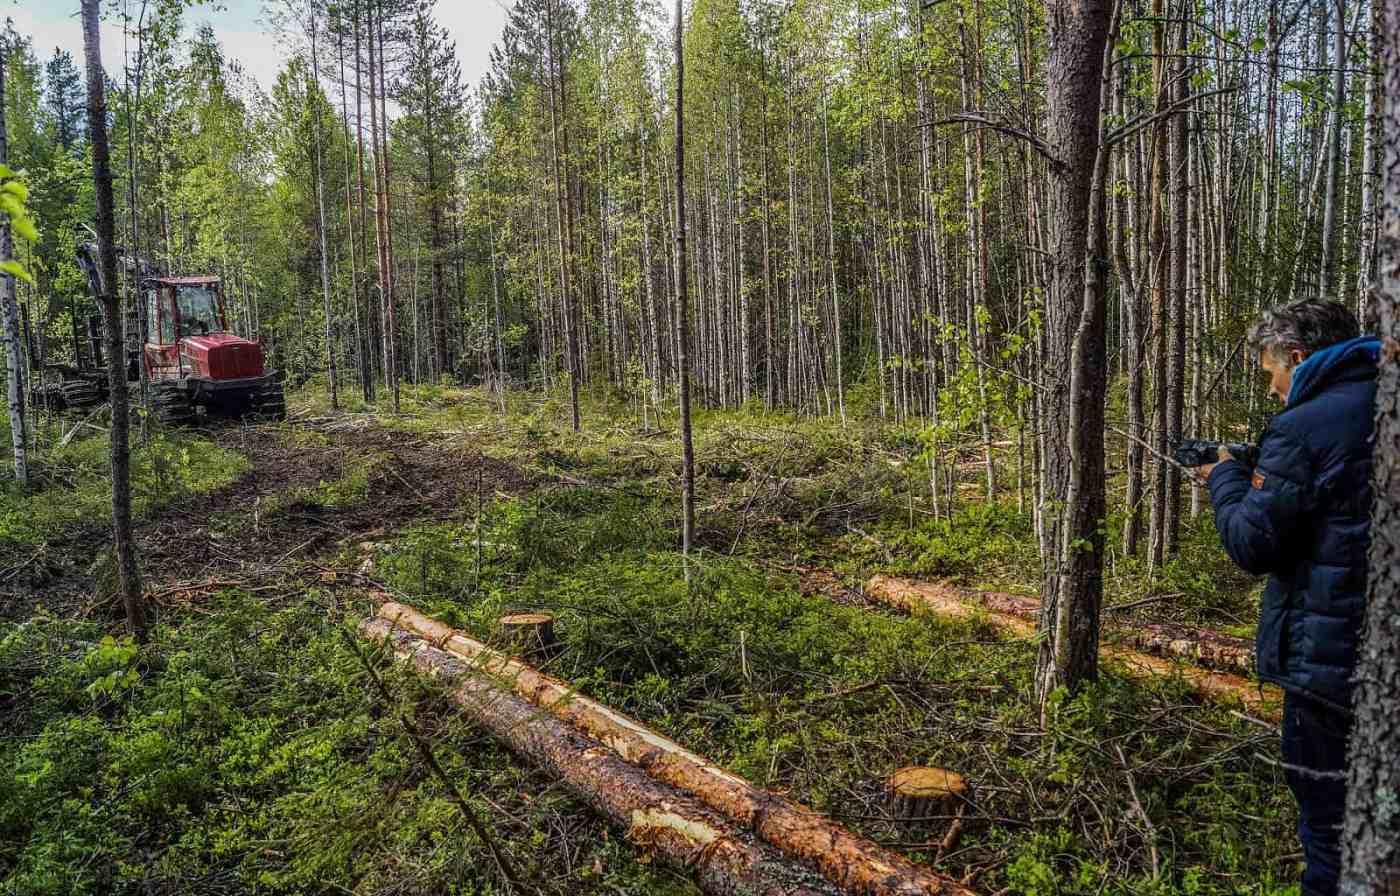 Archangelsk-21887.JPG - © European Wilderness Society CC BY-NC-ND 4.0